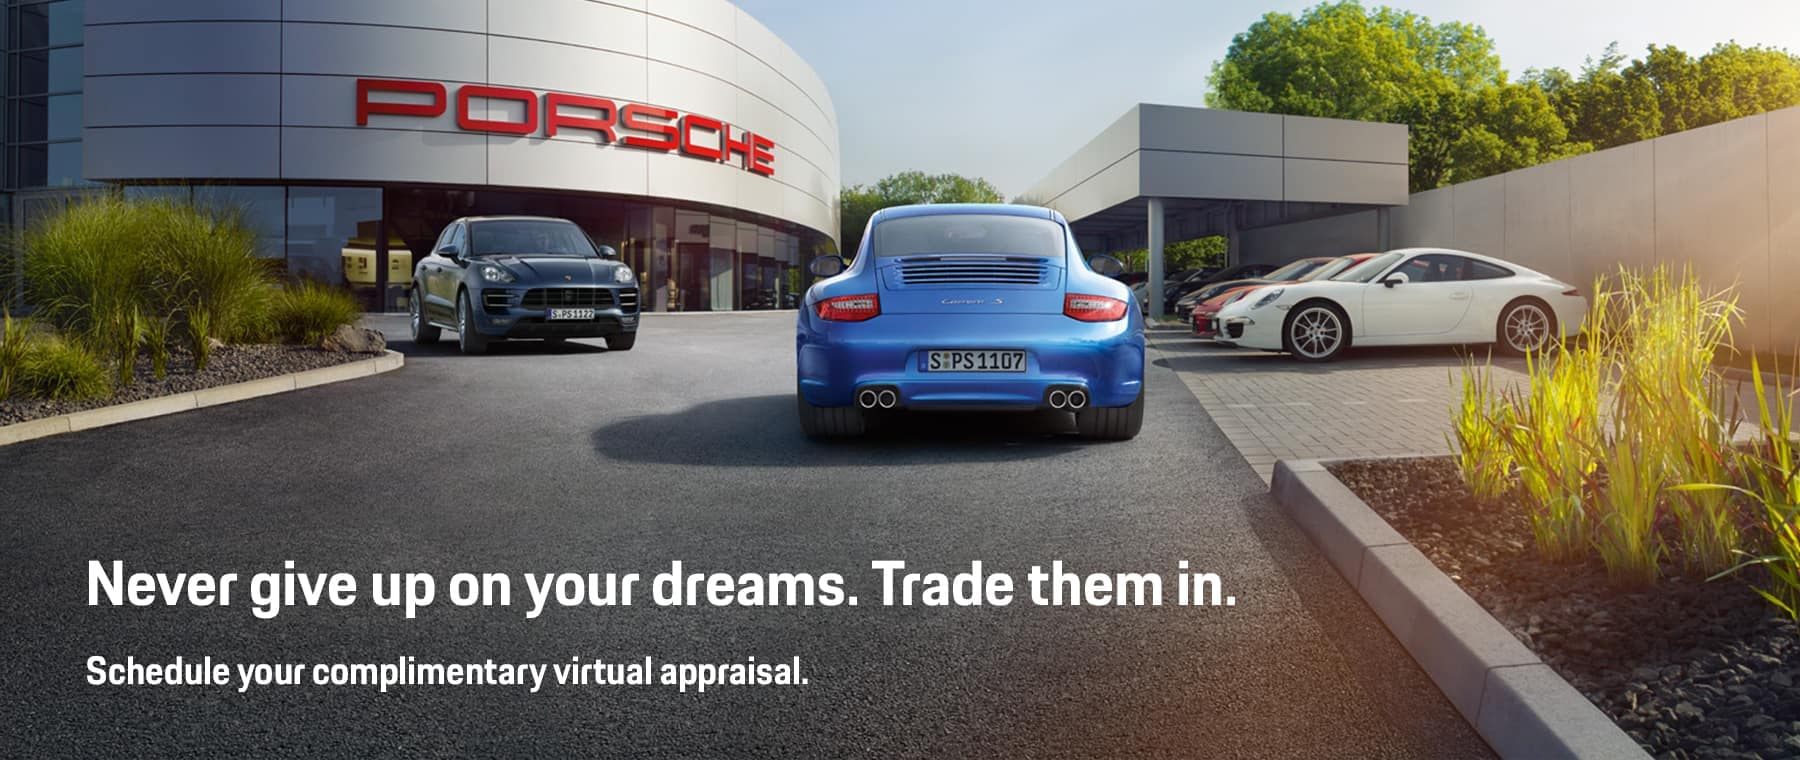 Trade-In-Porsche-Wilmington